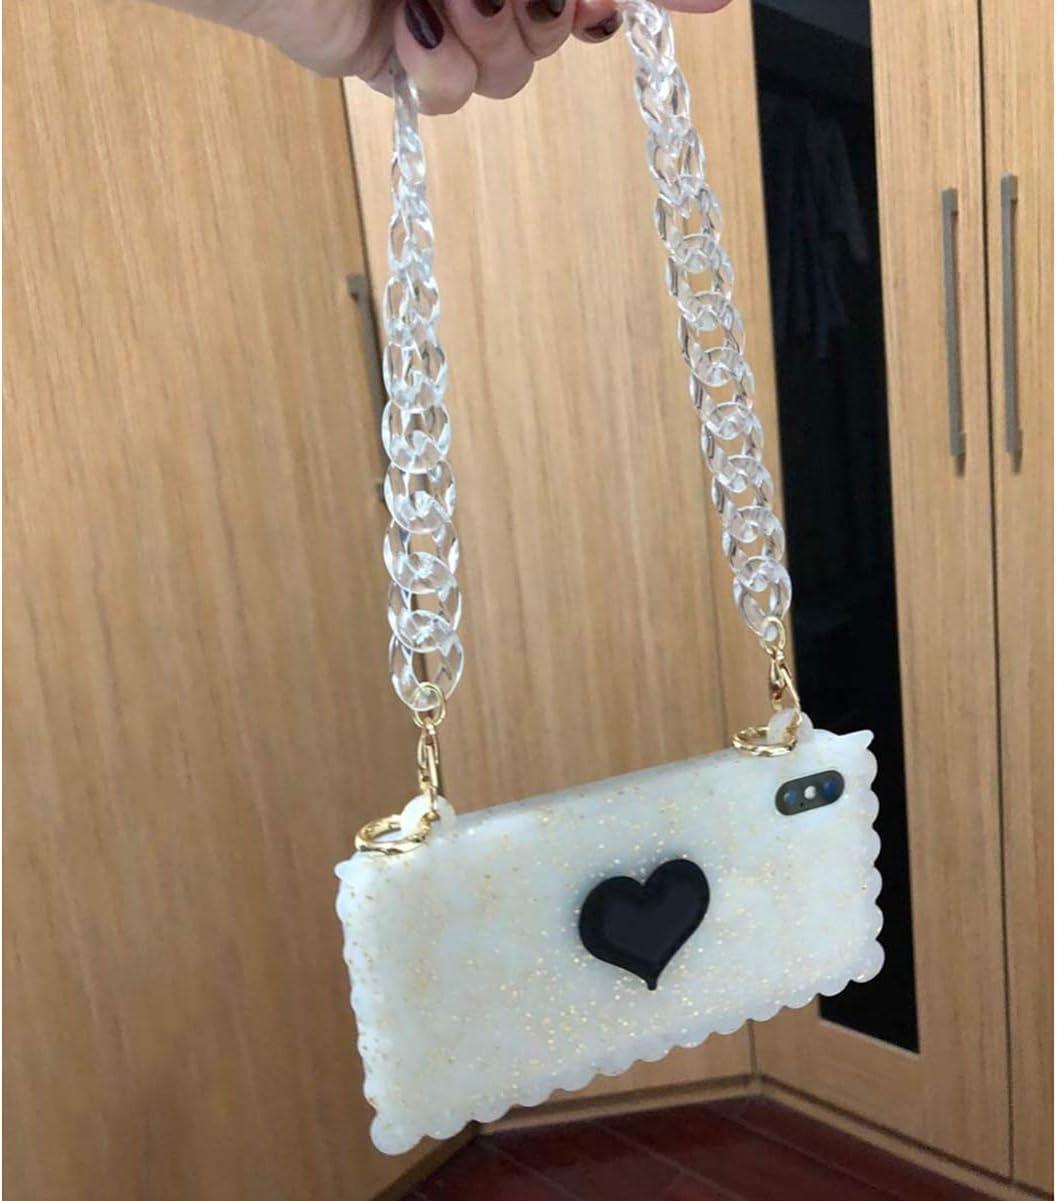 Black SUPVOX Acrylic Bag Chain Straps Plastic Purse Straps Replacement Shoulder Bag Chain for DIY Purse Making Repairing 120cm